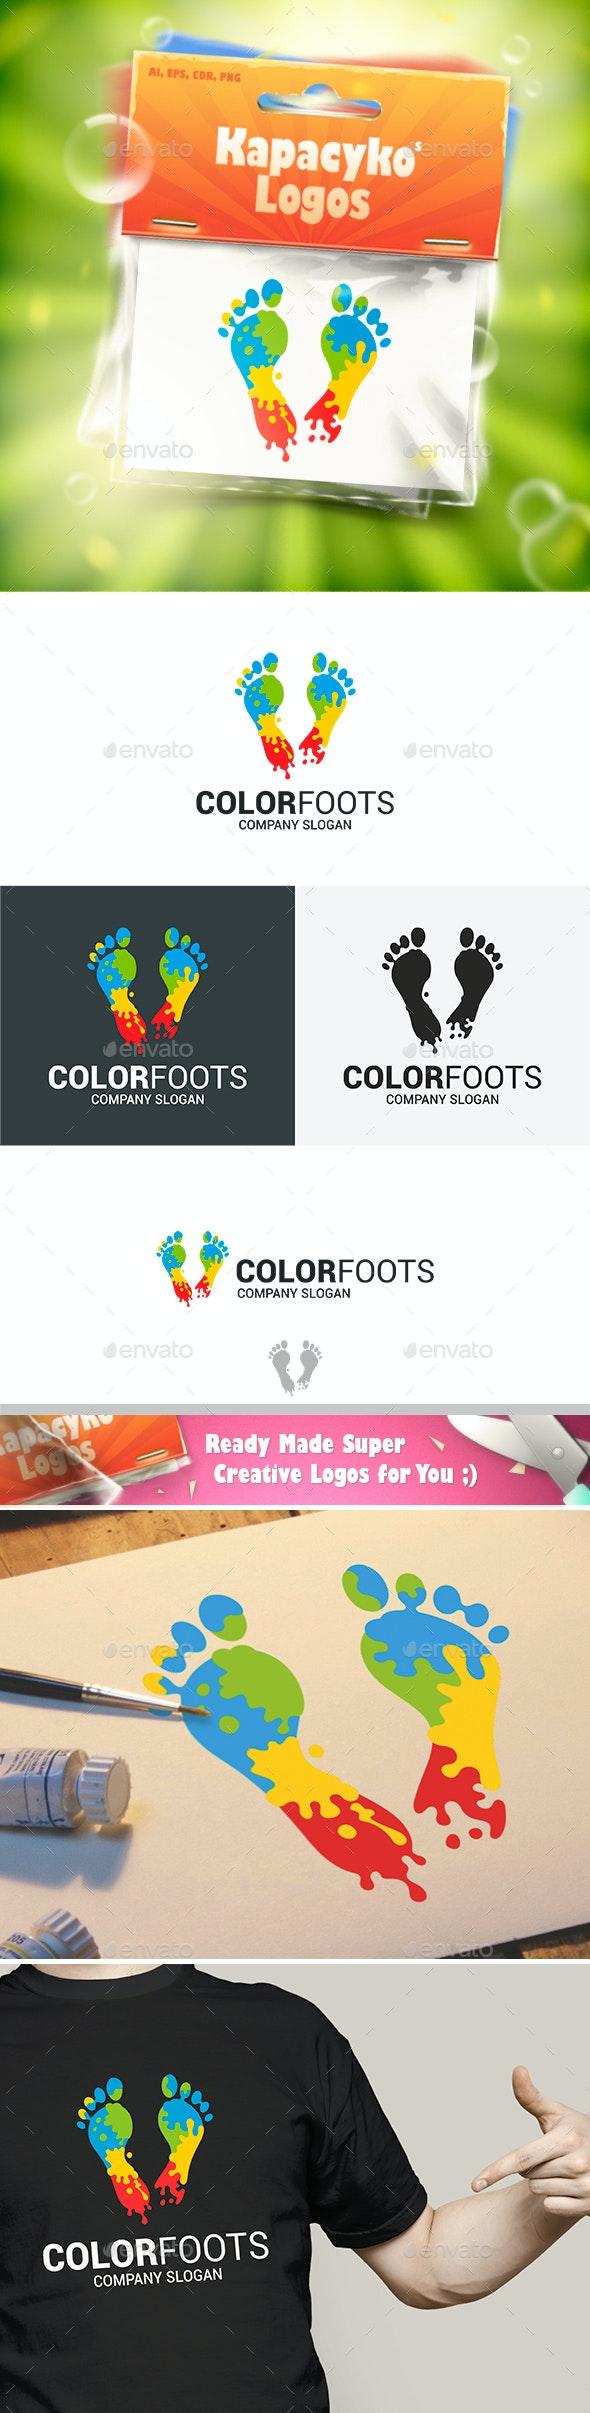 Color Foot Logo - Abstract Logo Templates